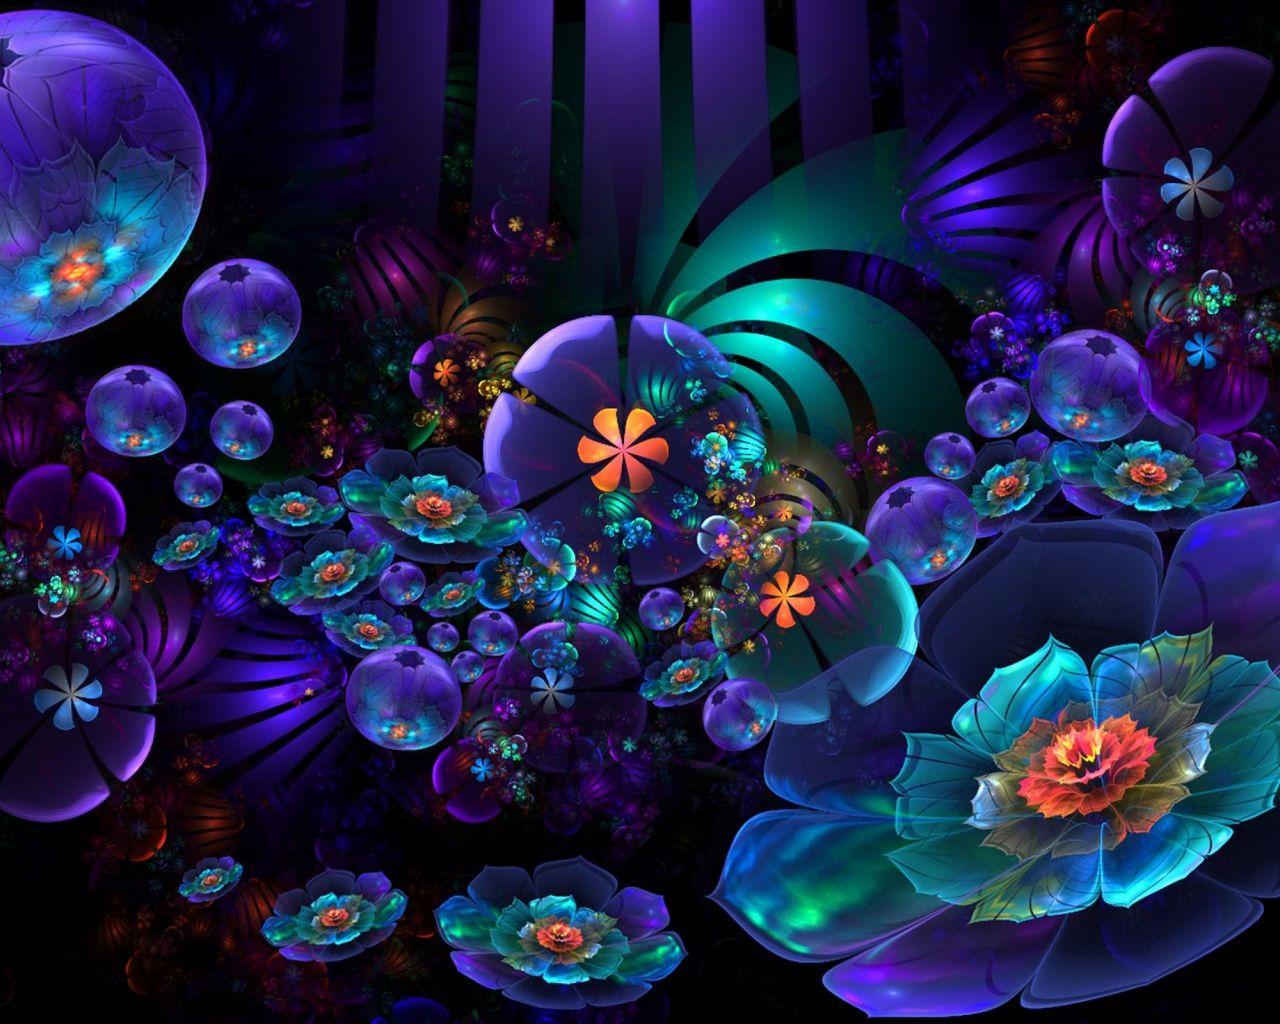 Neon Flower Wallpapers - Wallpaper Cave